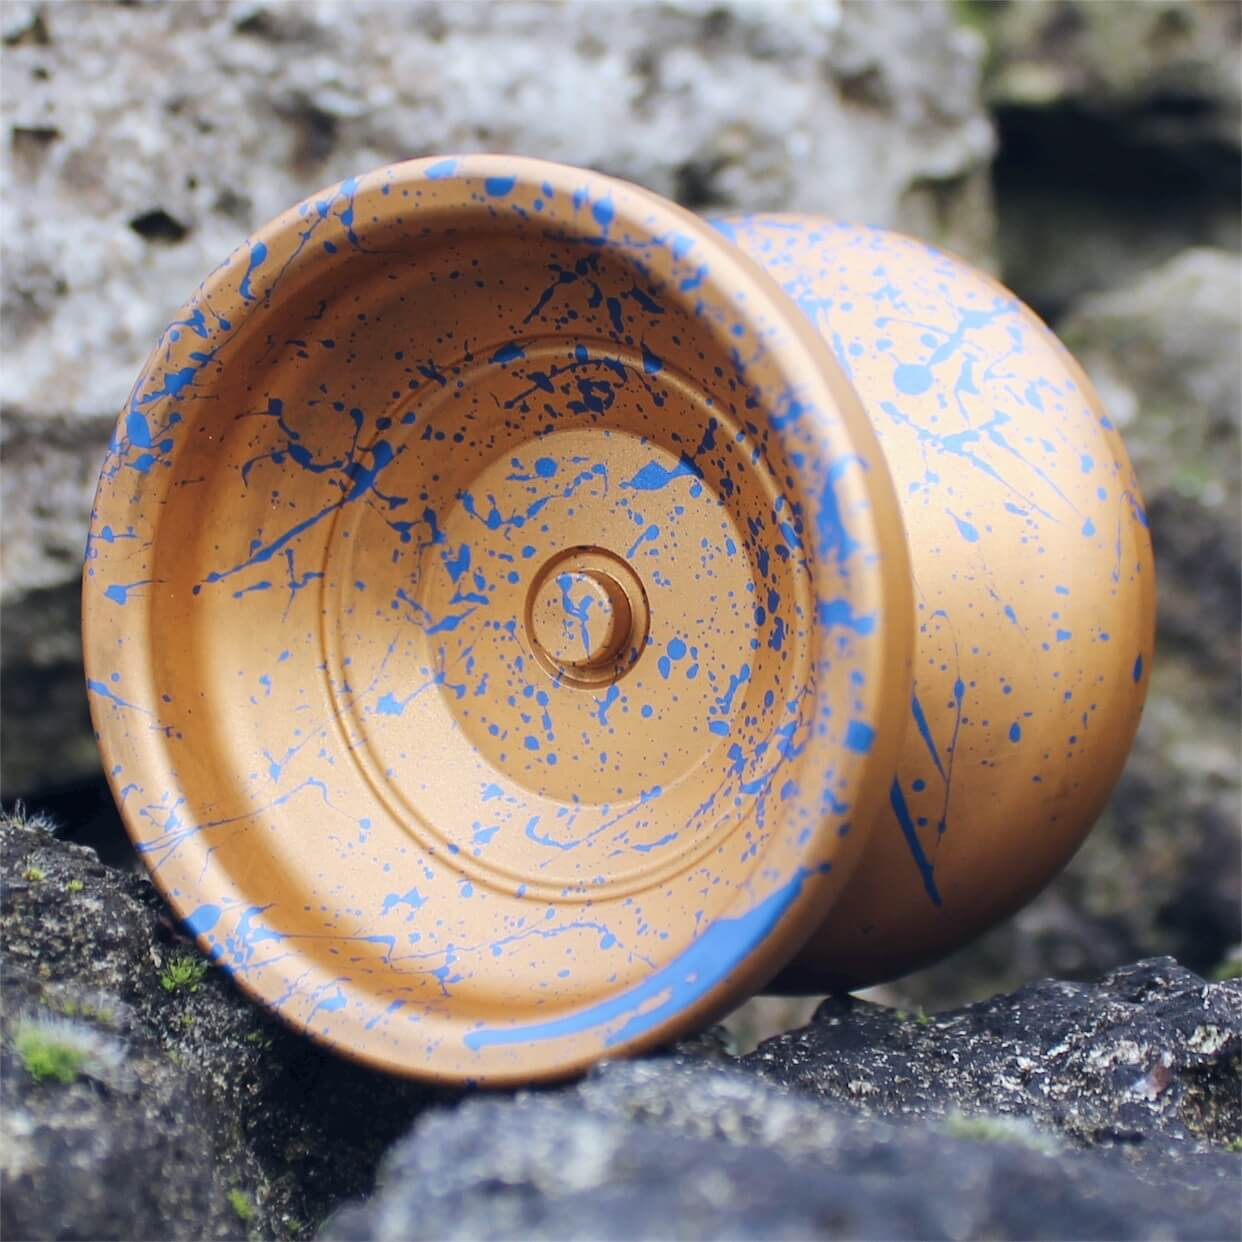 Yoyofficer Urban - Arany / Kék splash